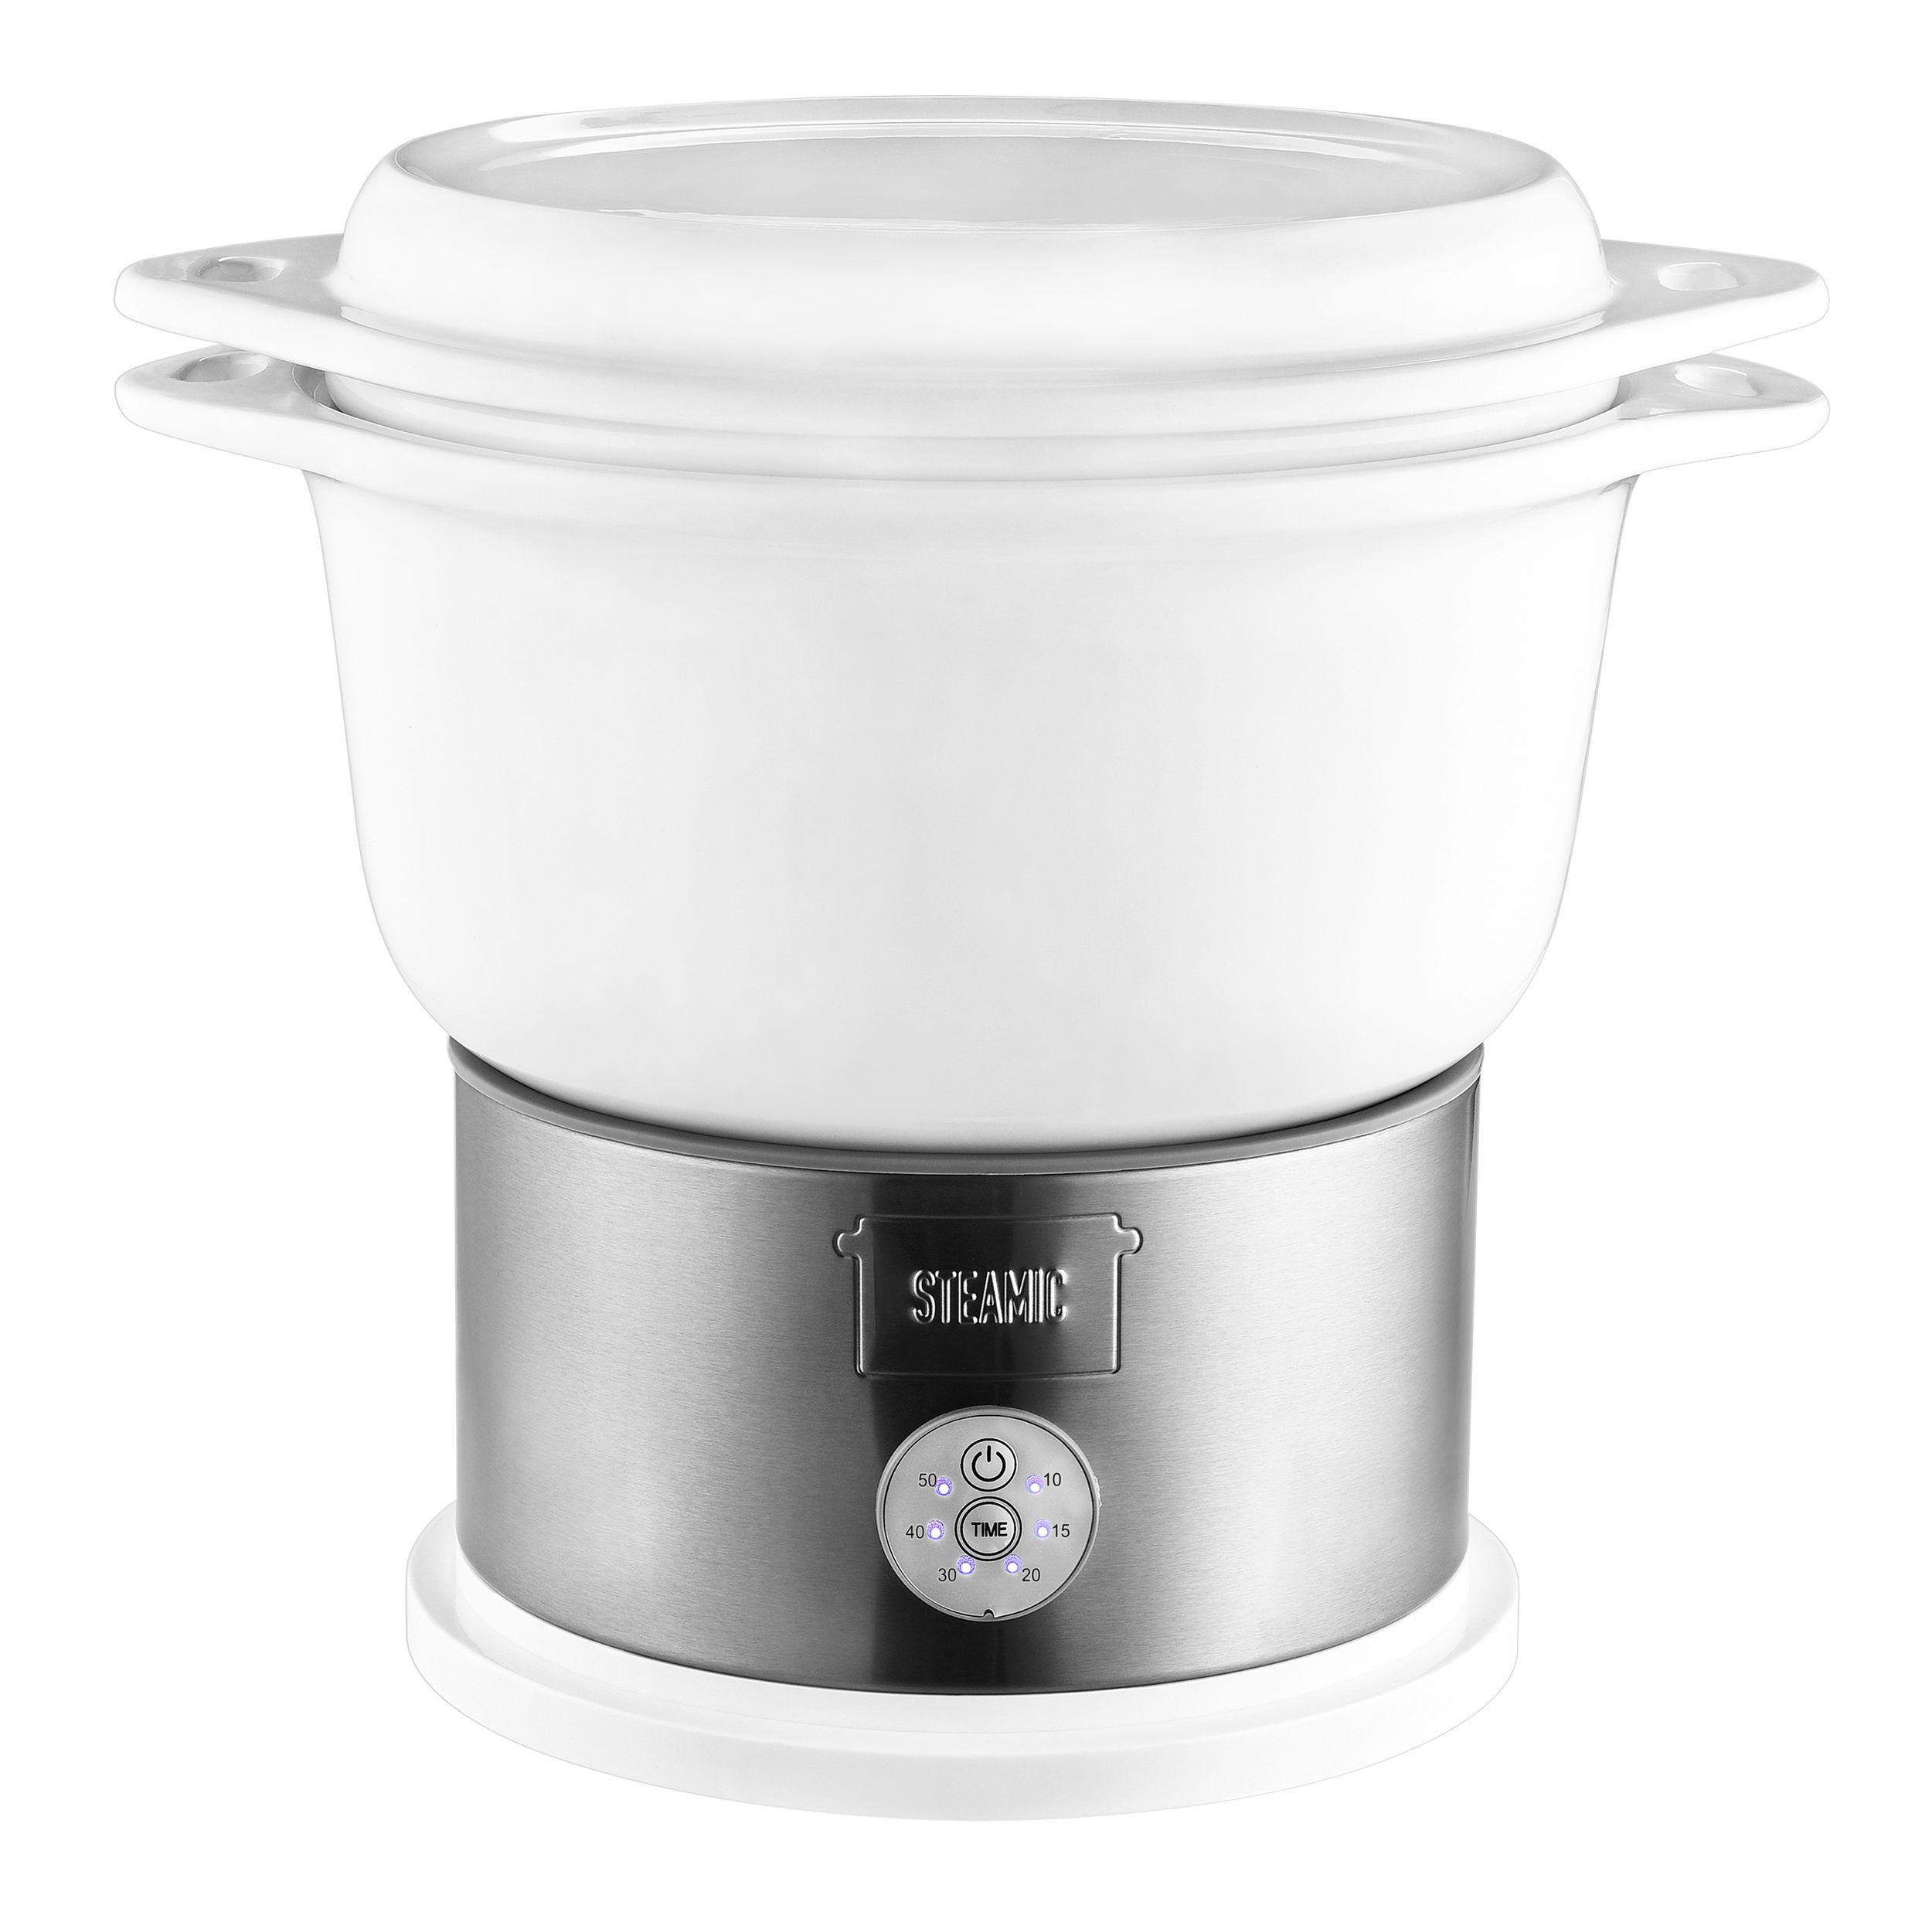 KERAMIK Dampfgarer BPA-frei Timer One-Touch-Bedienung 4,5 L (Karton beschädigt)*40382 Bild 4